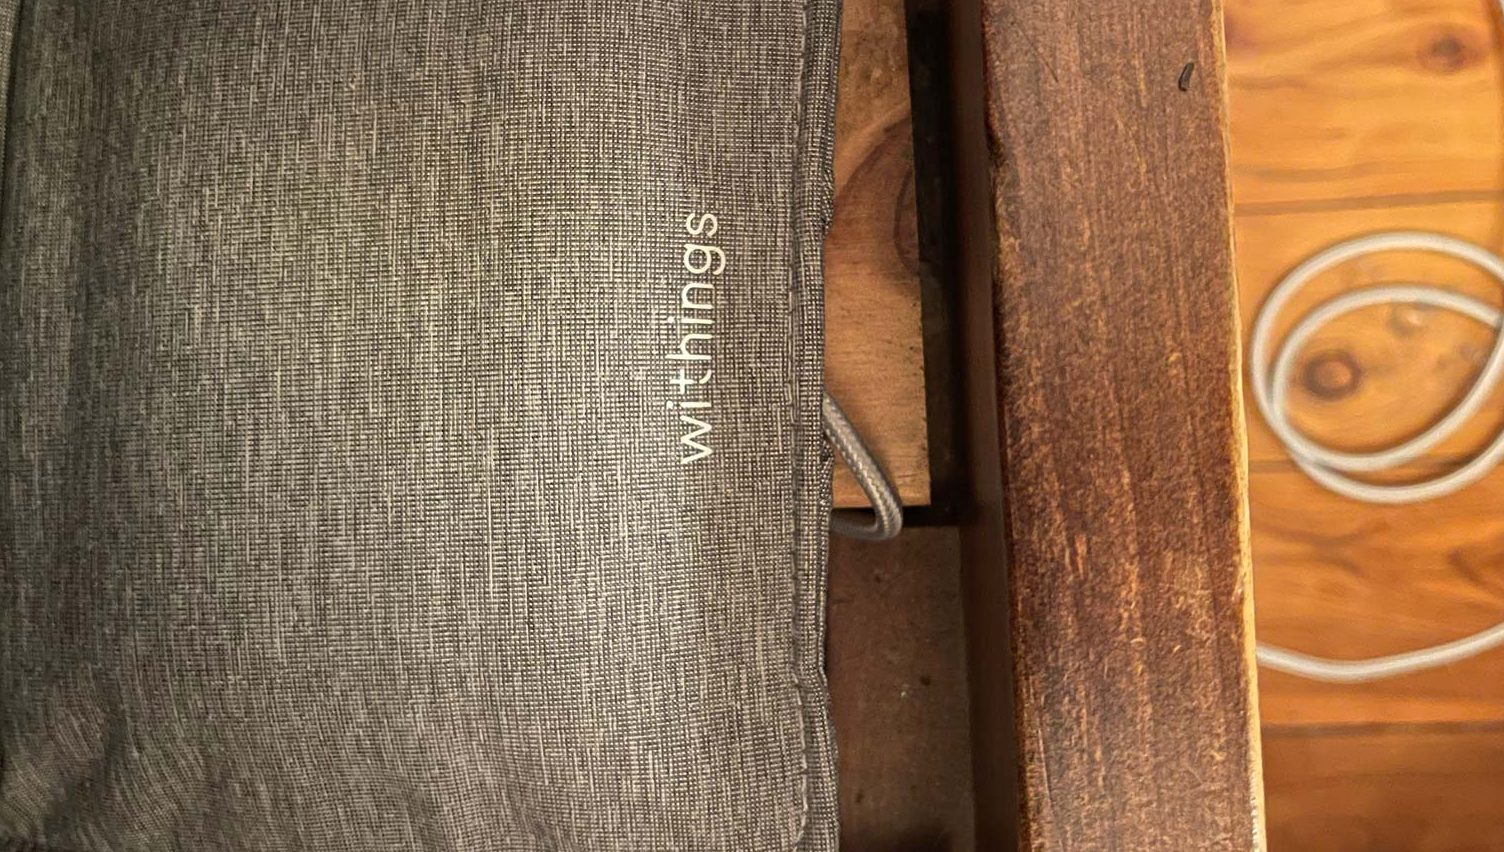 The Sleep Analyser under the bed